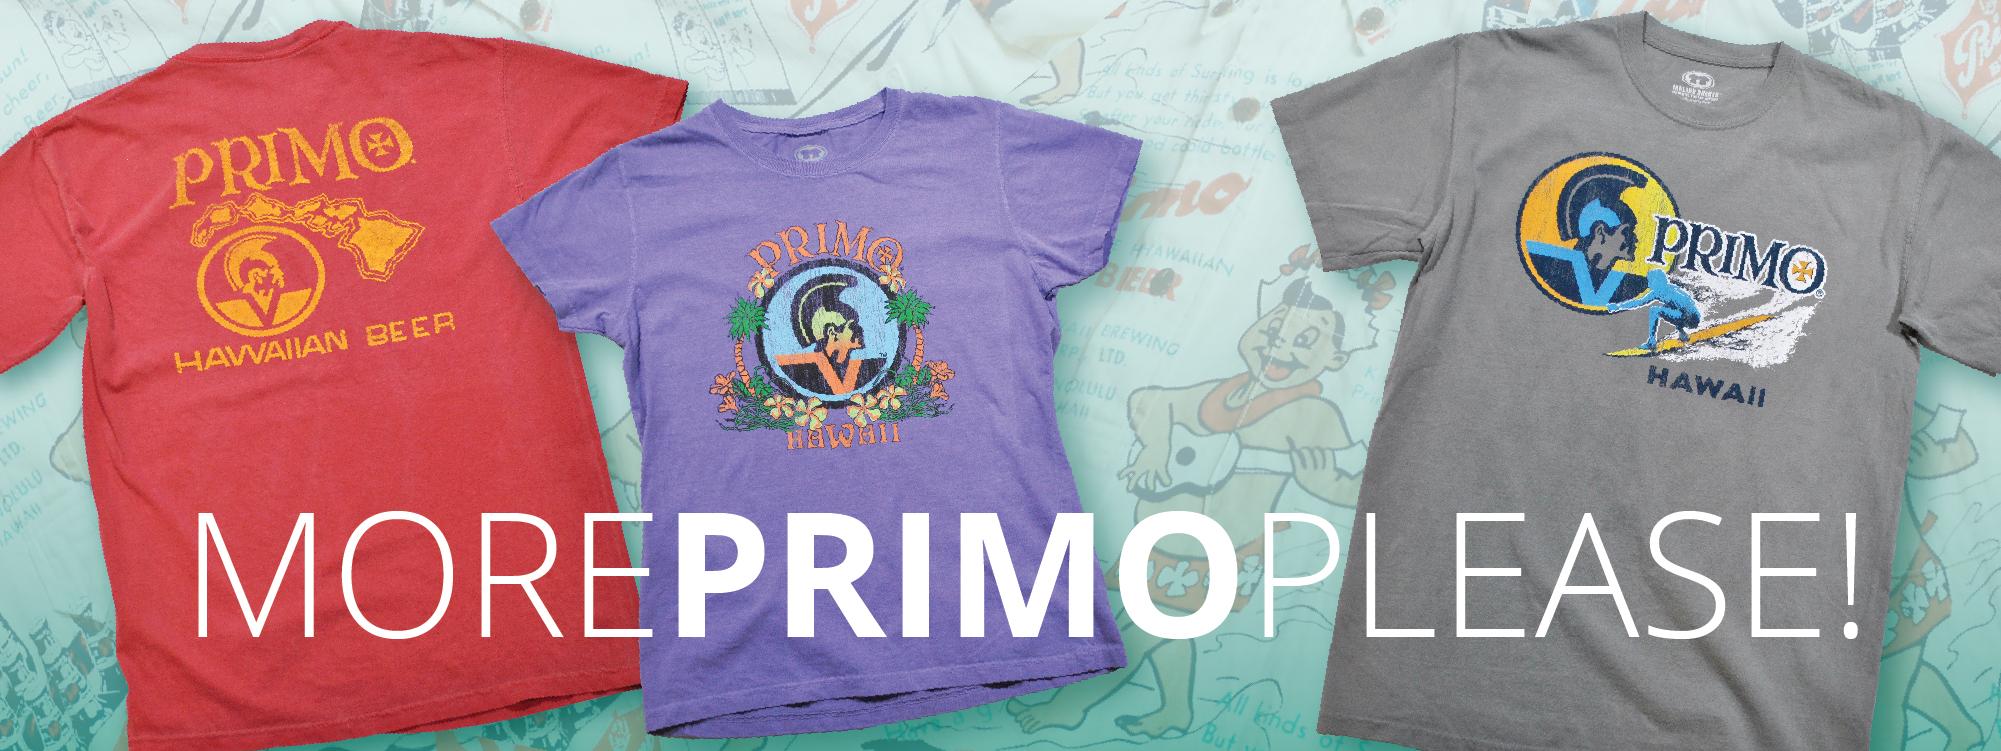 vintage primo t-shirts